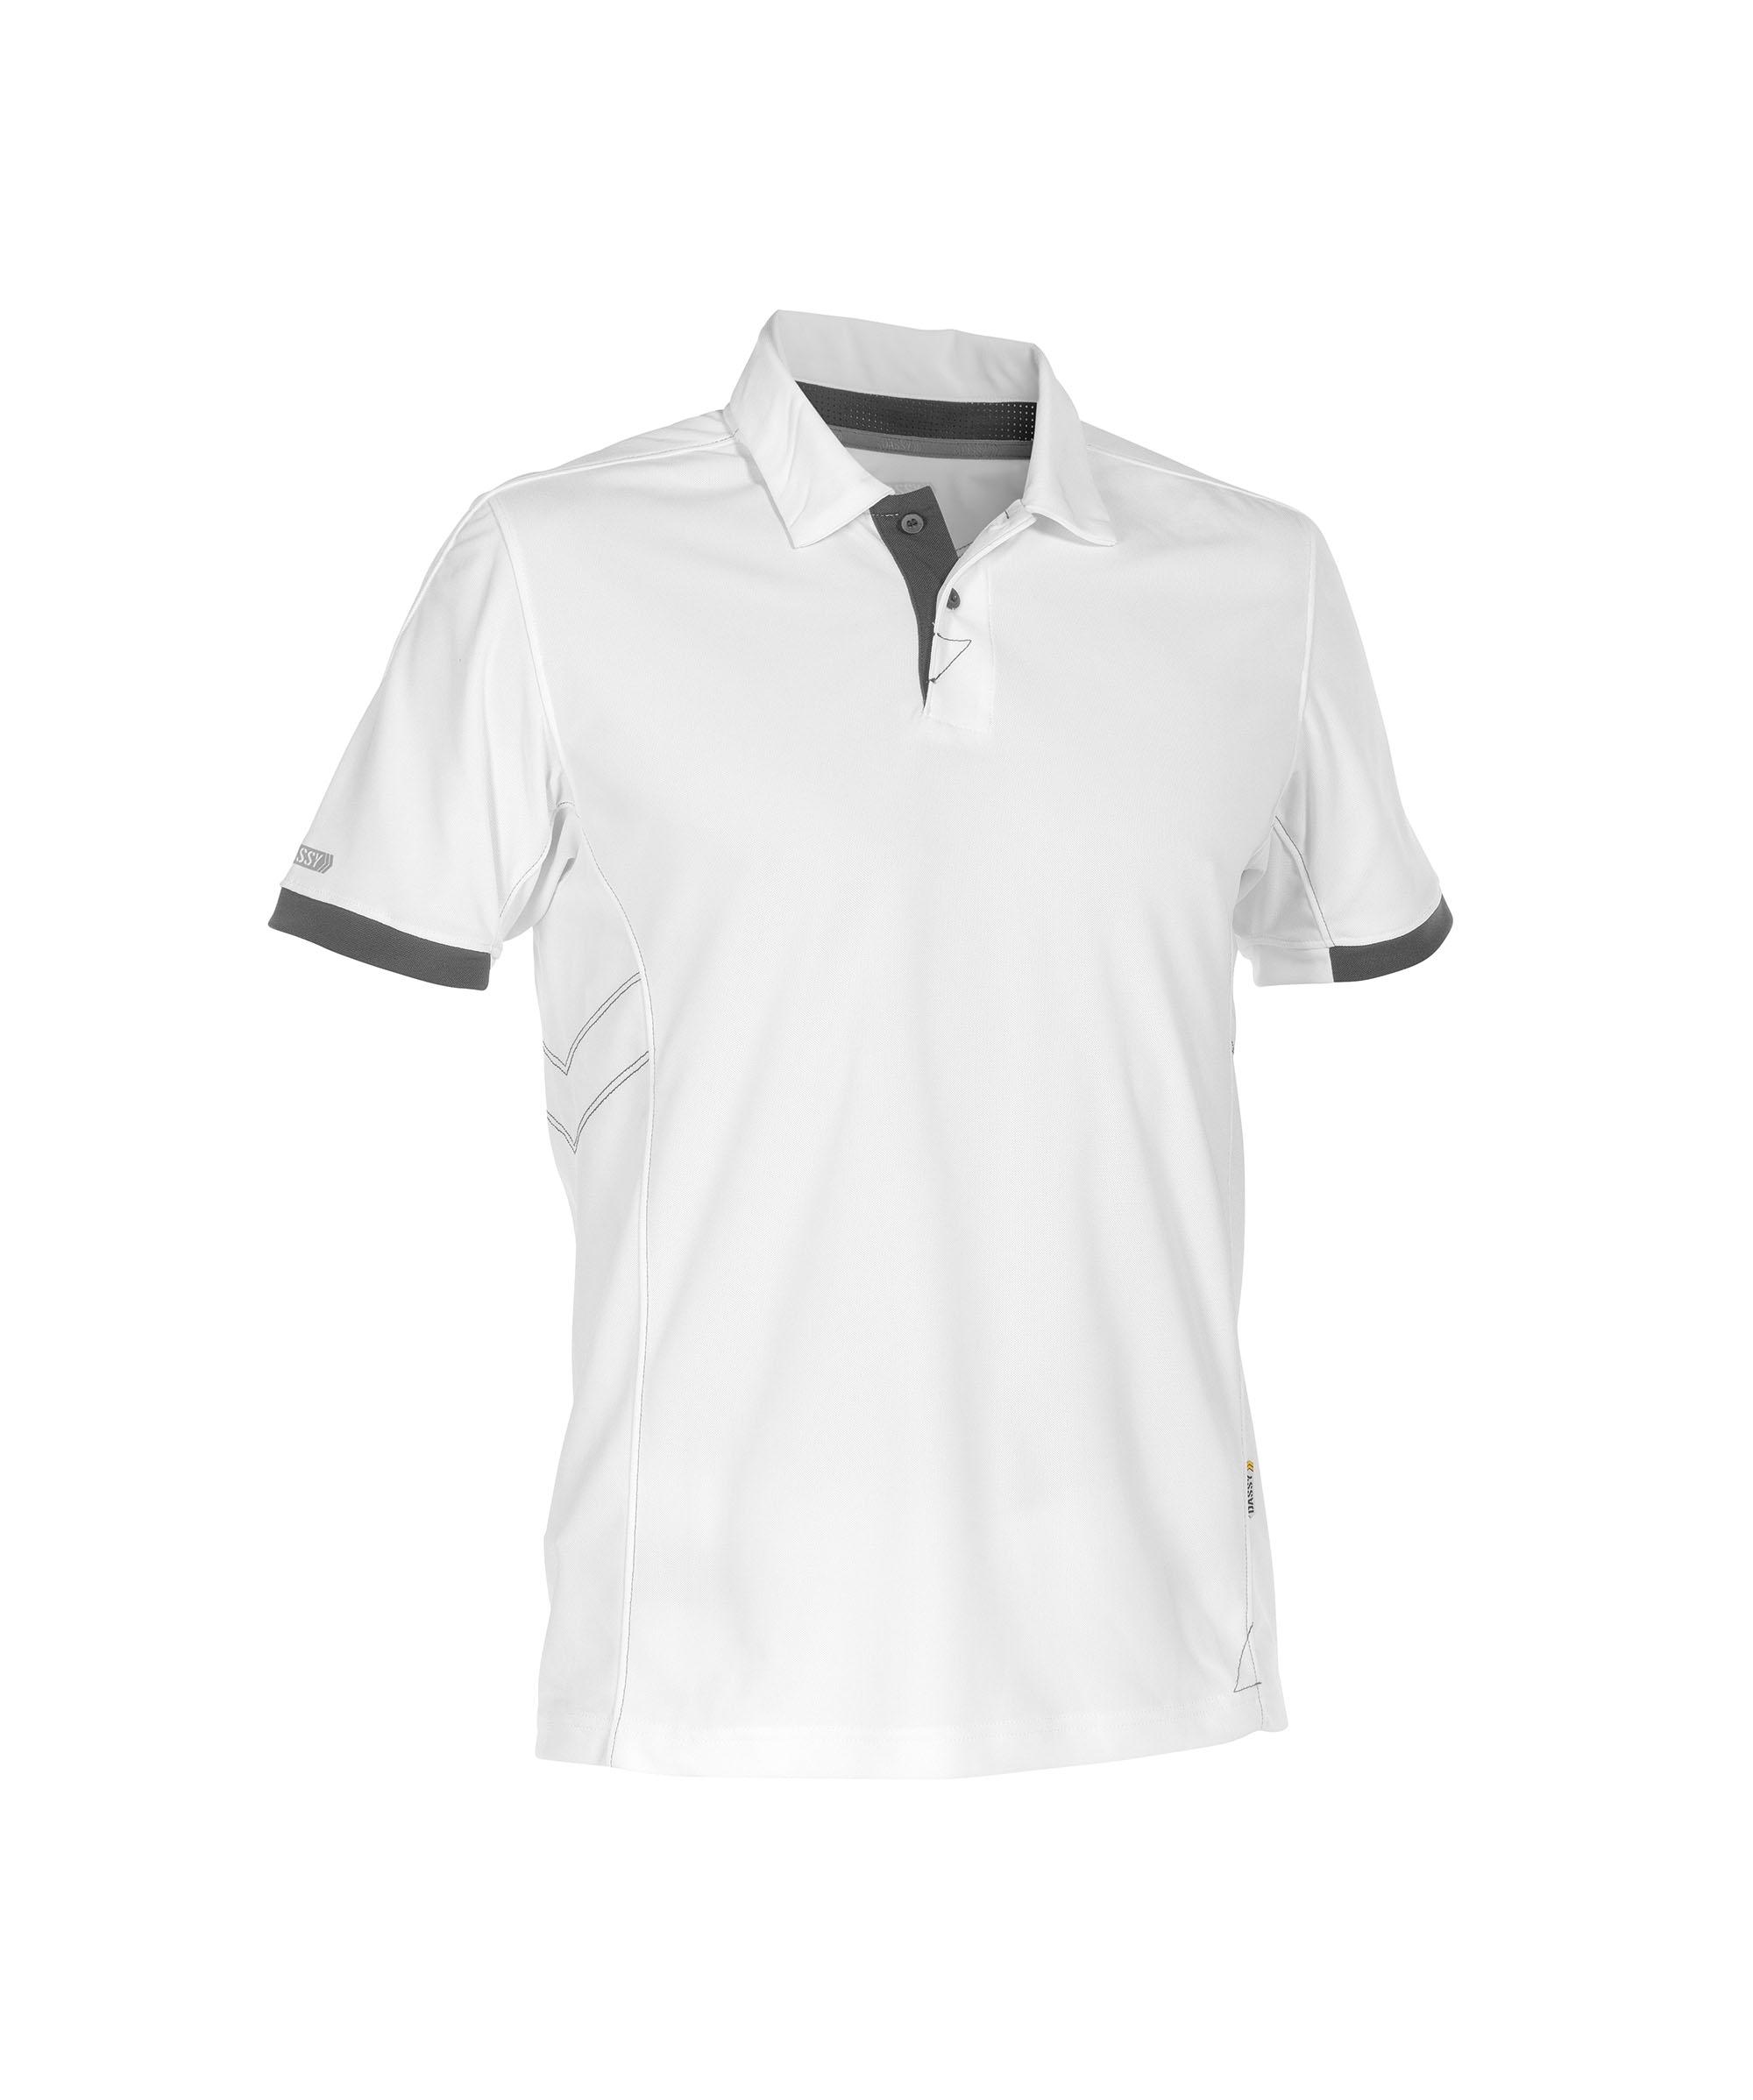 Dassy, Traxion Poloshirt 710026